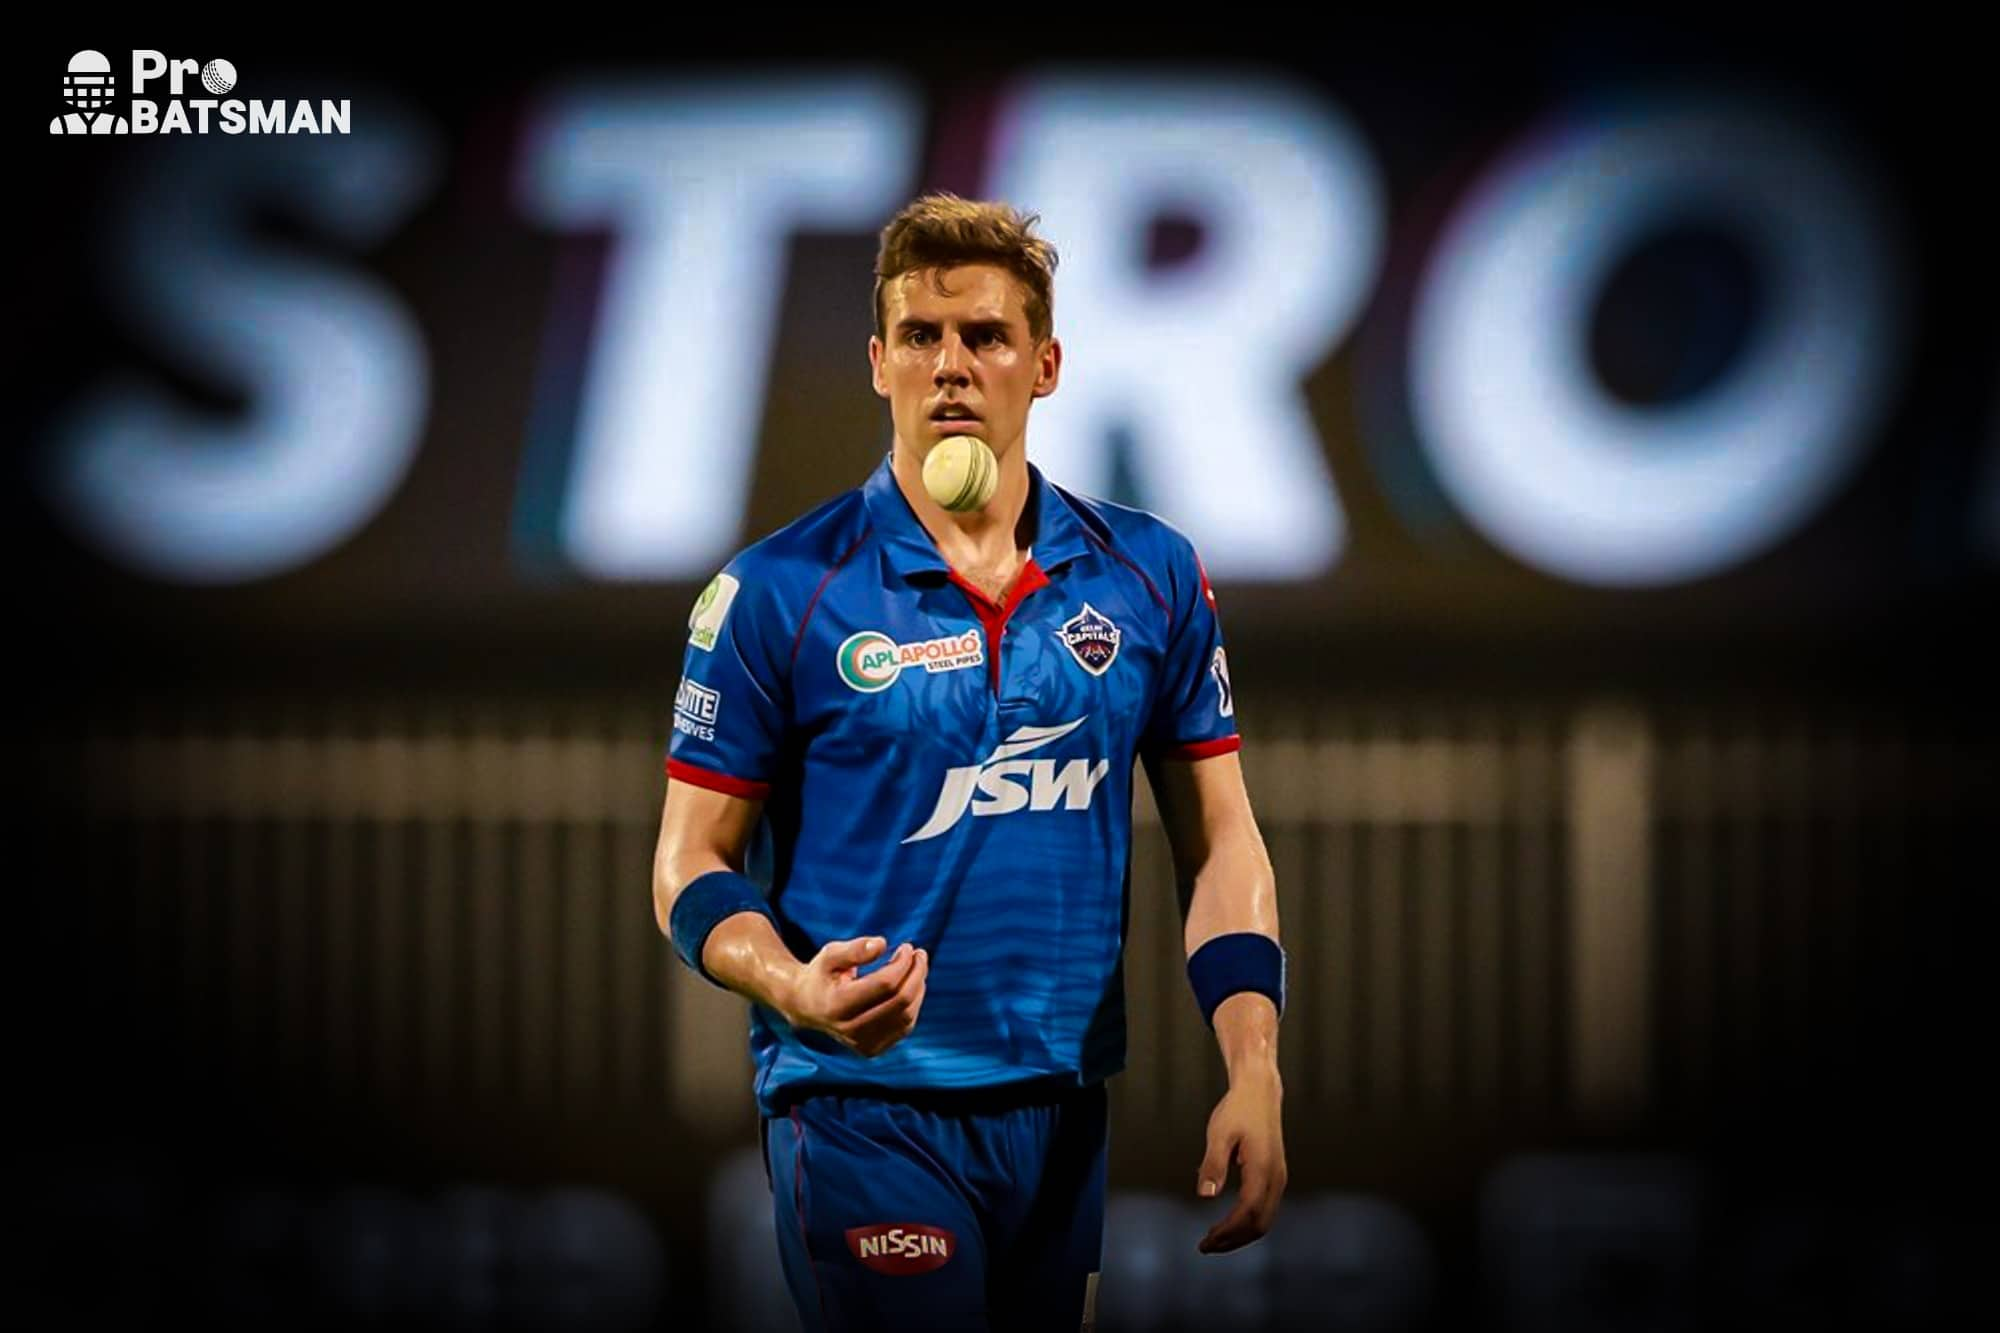 IPL 2021: Delhi Capitals Pacer Anrich Nortje Tests COVID-19 Positive - Reports